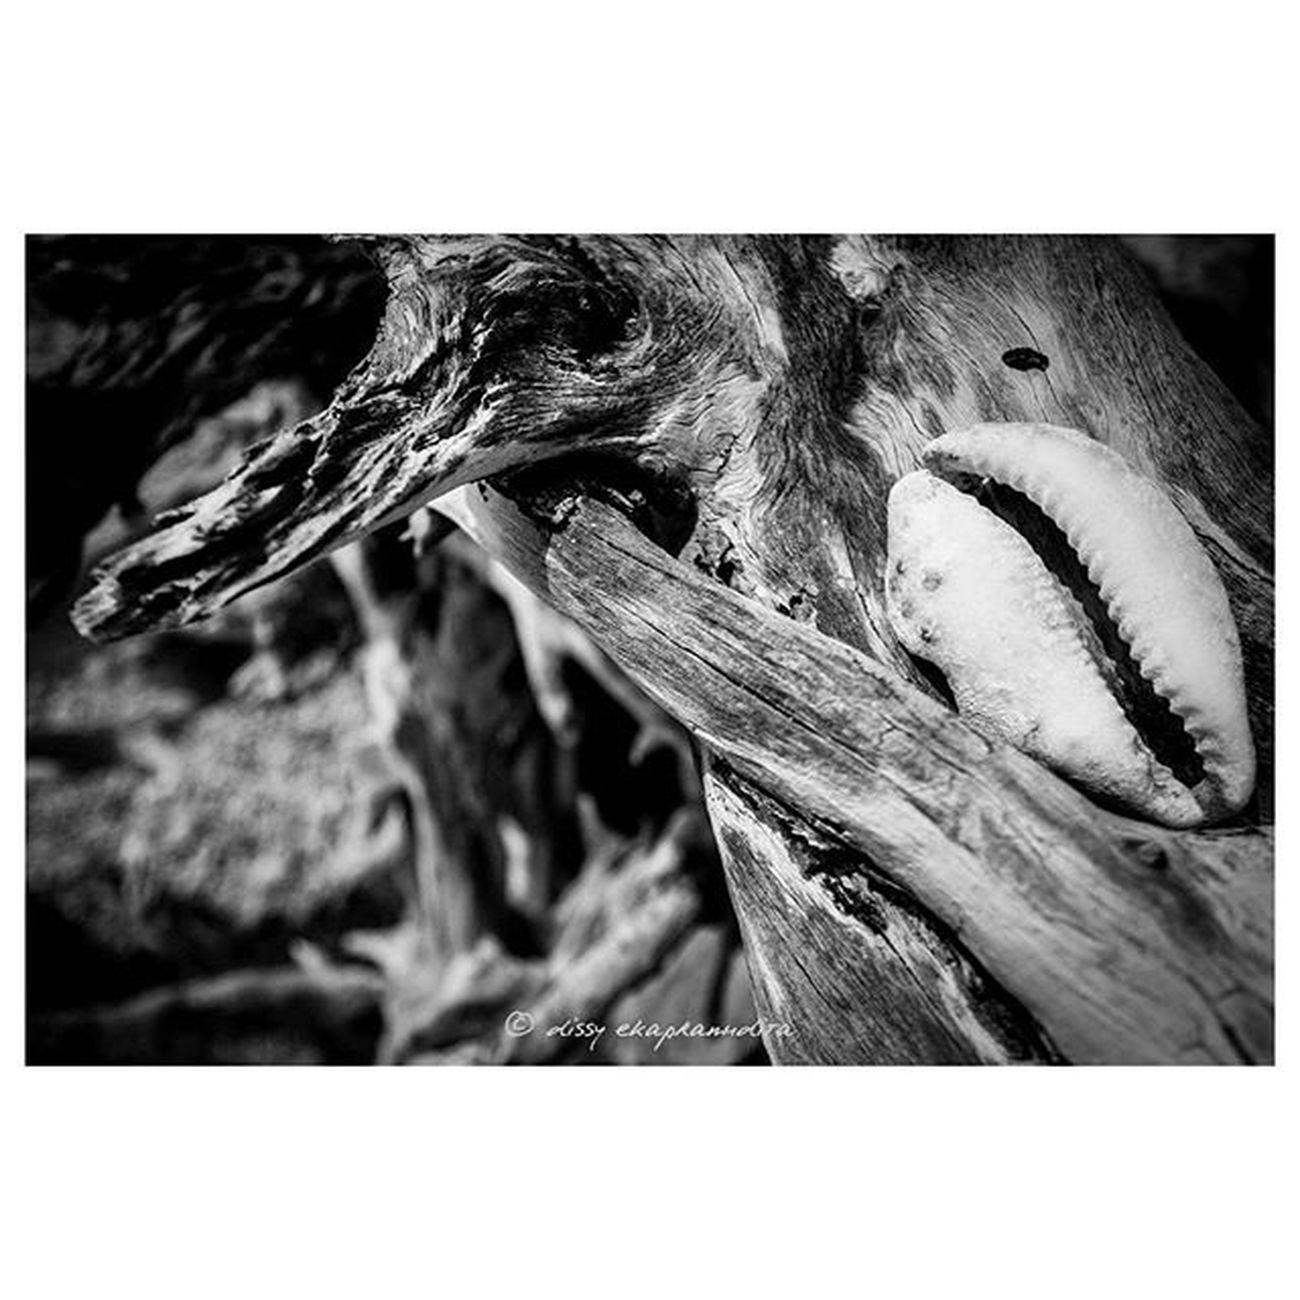 Kewuk Shell Kerang Beach BeautifulIndonesia INDONESIA 1000kata Asiangeographic Natgeoadventure Instalike Instagram Instagood Instadaily Photooftheday Blackandwhite